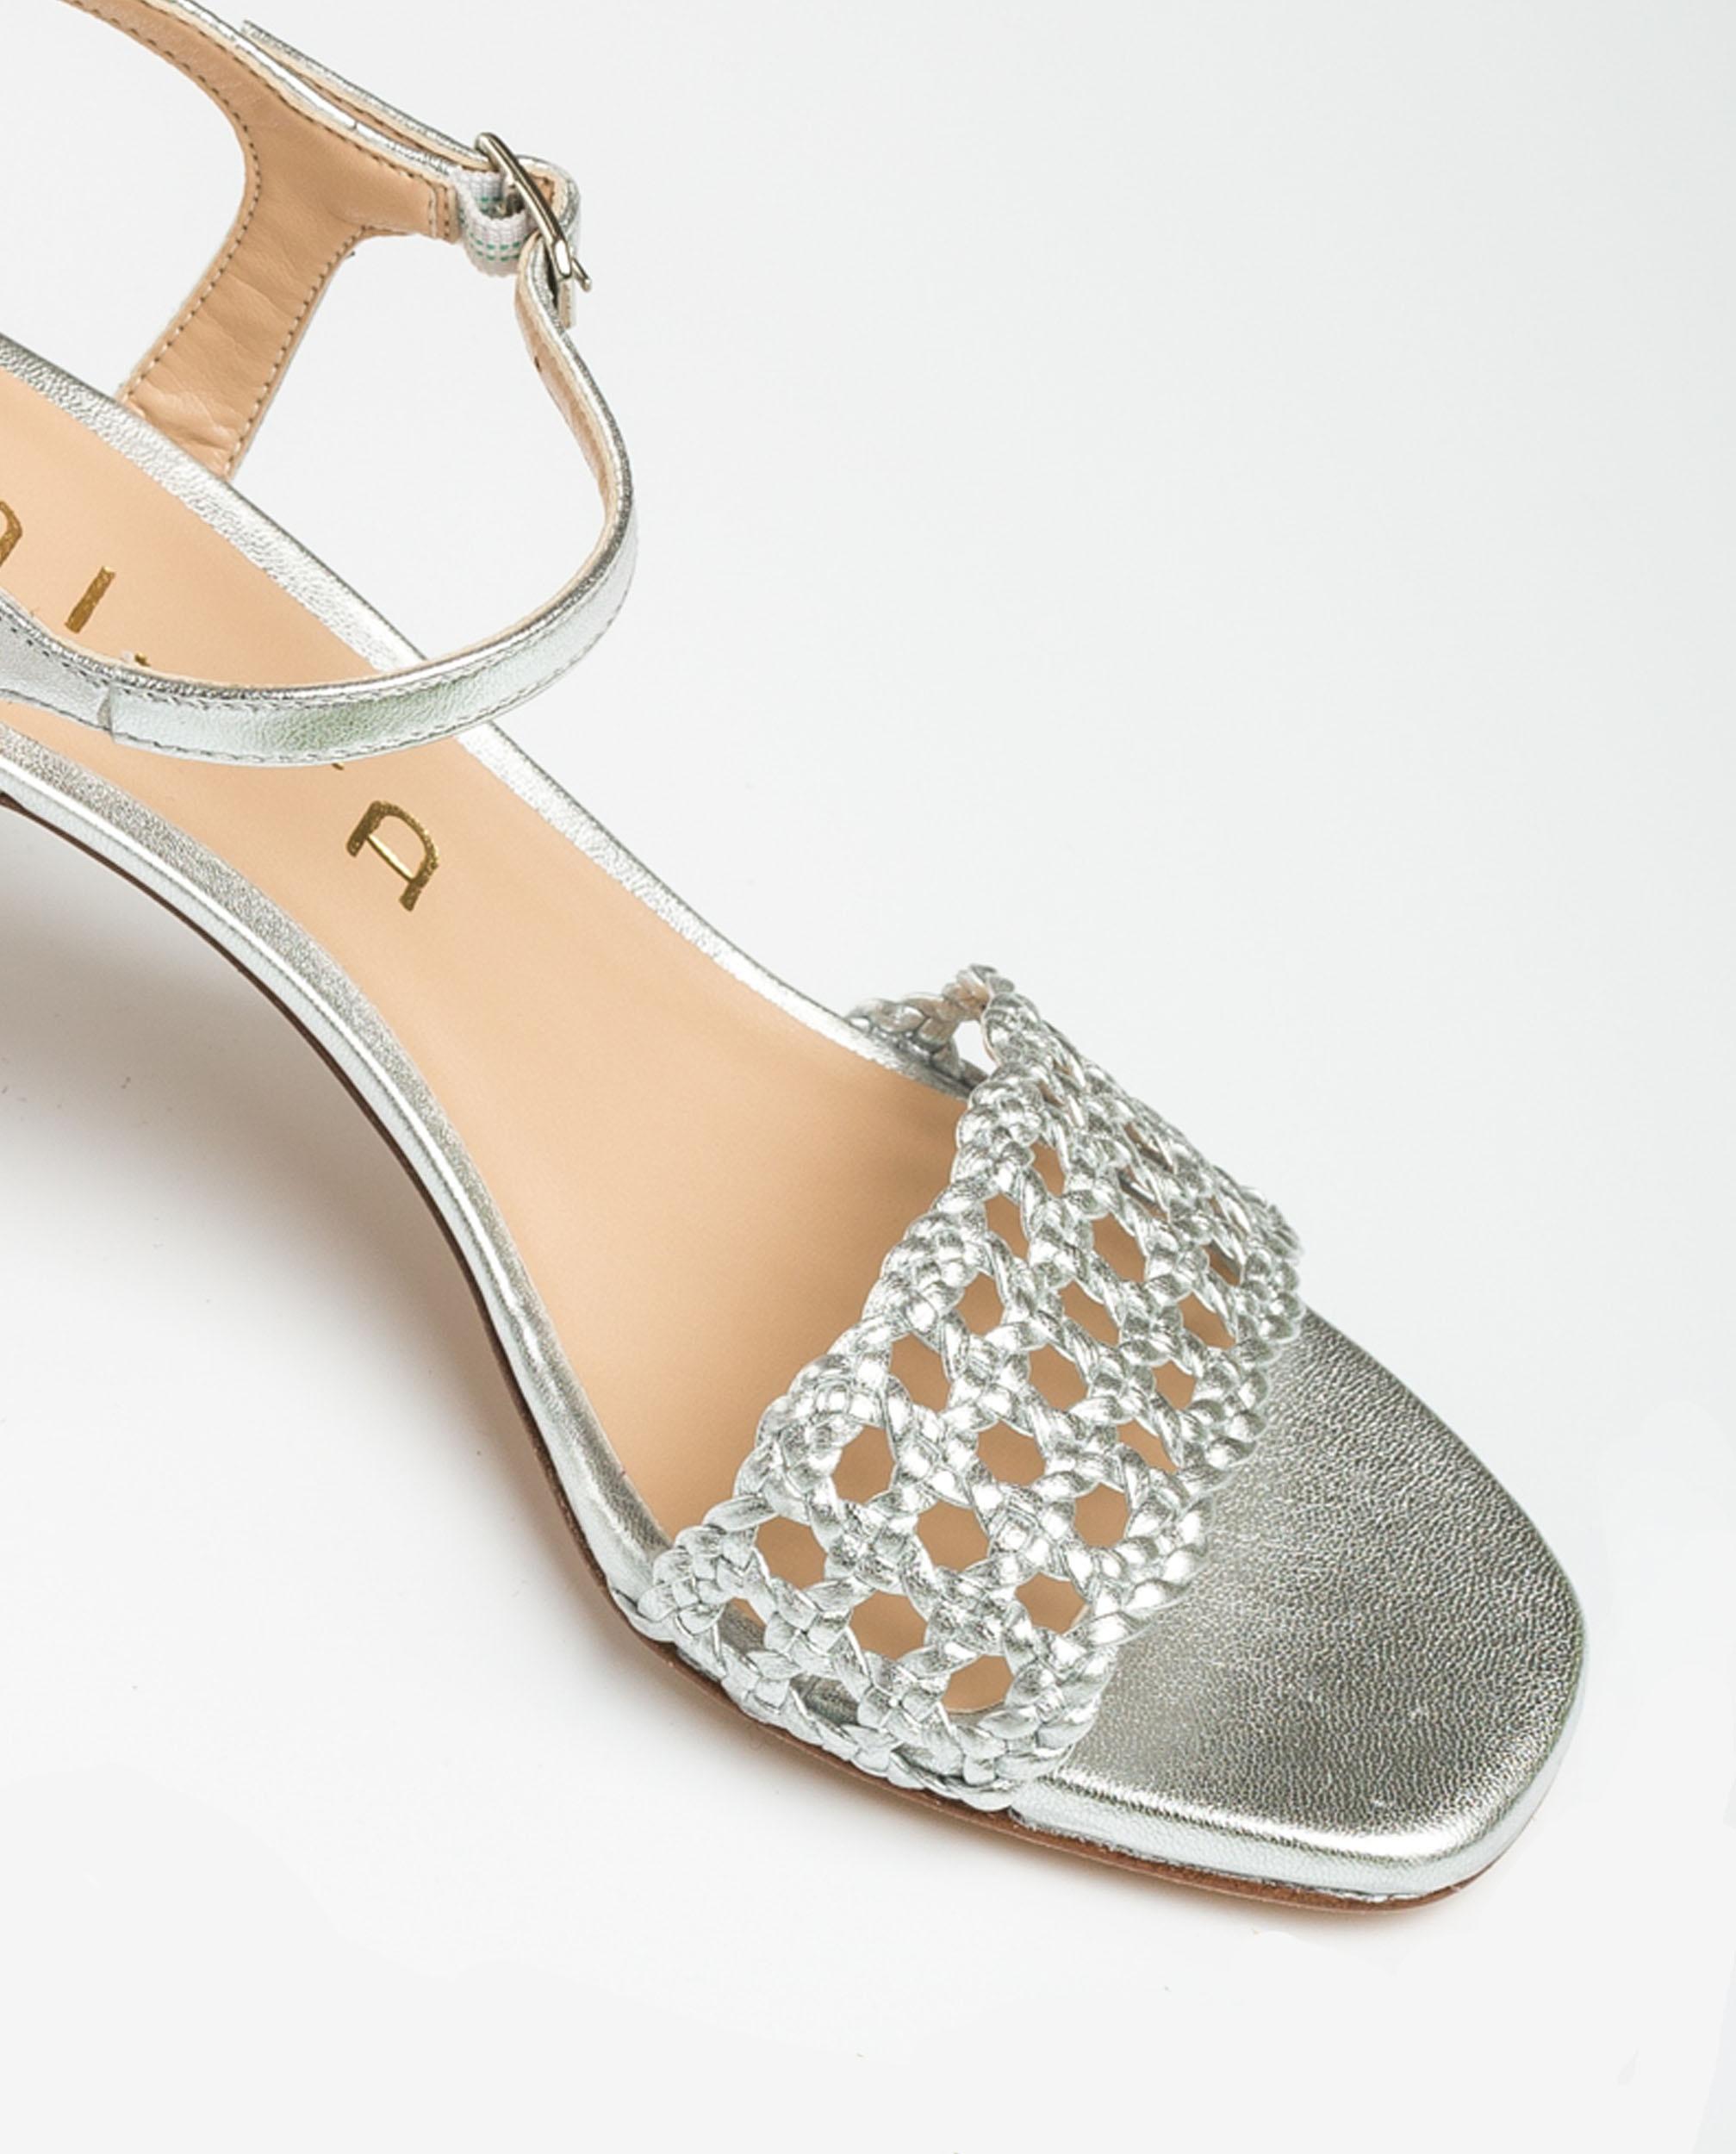 UNISA Sandalia metalizada macramé MAXWEL_LMT silver